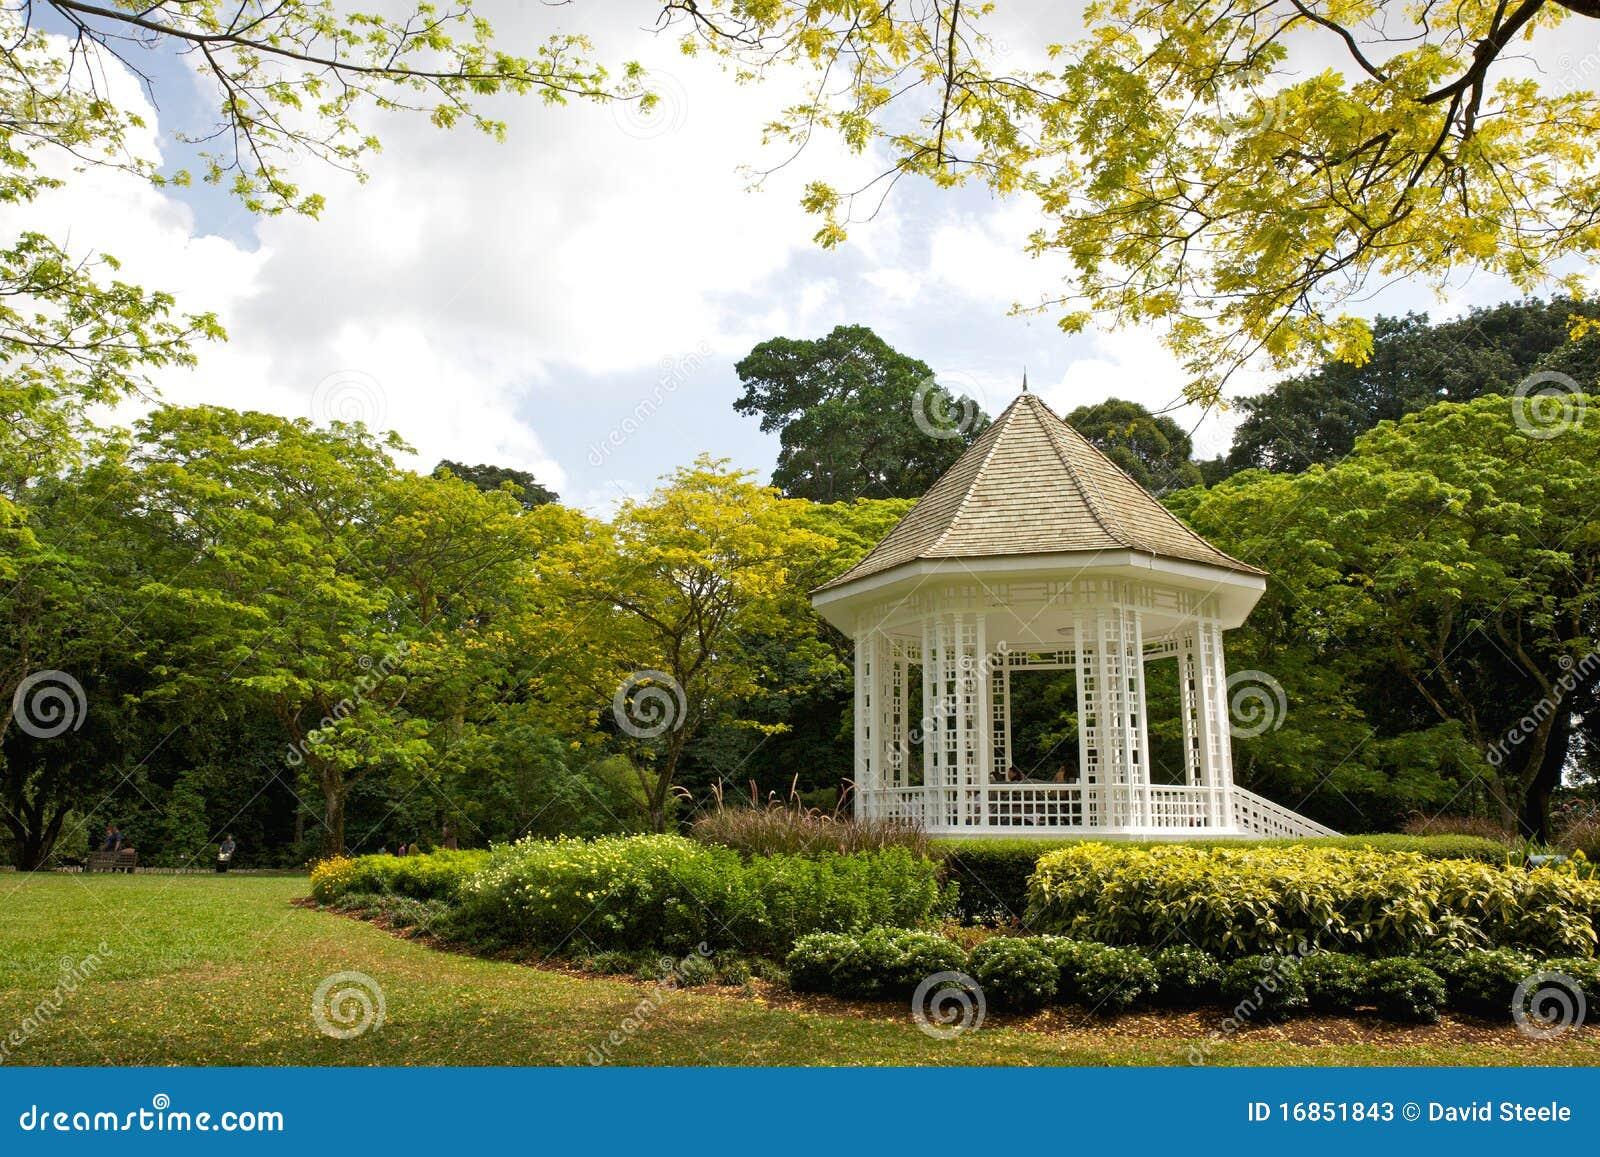 The Bandstand stock image  Image of performance, botanic